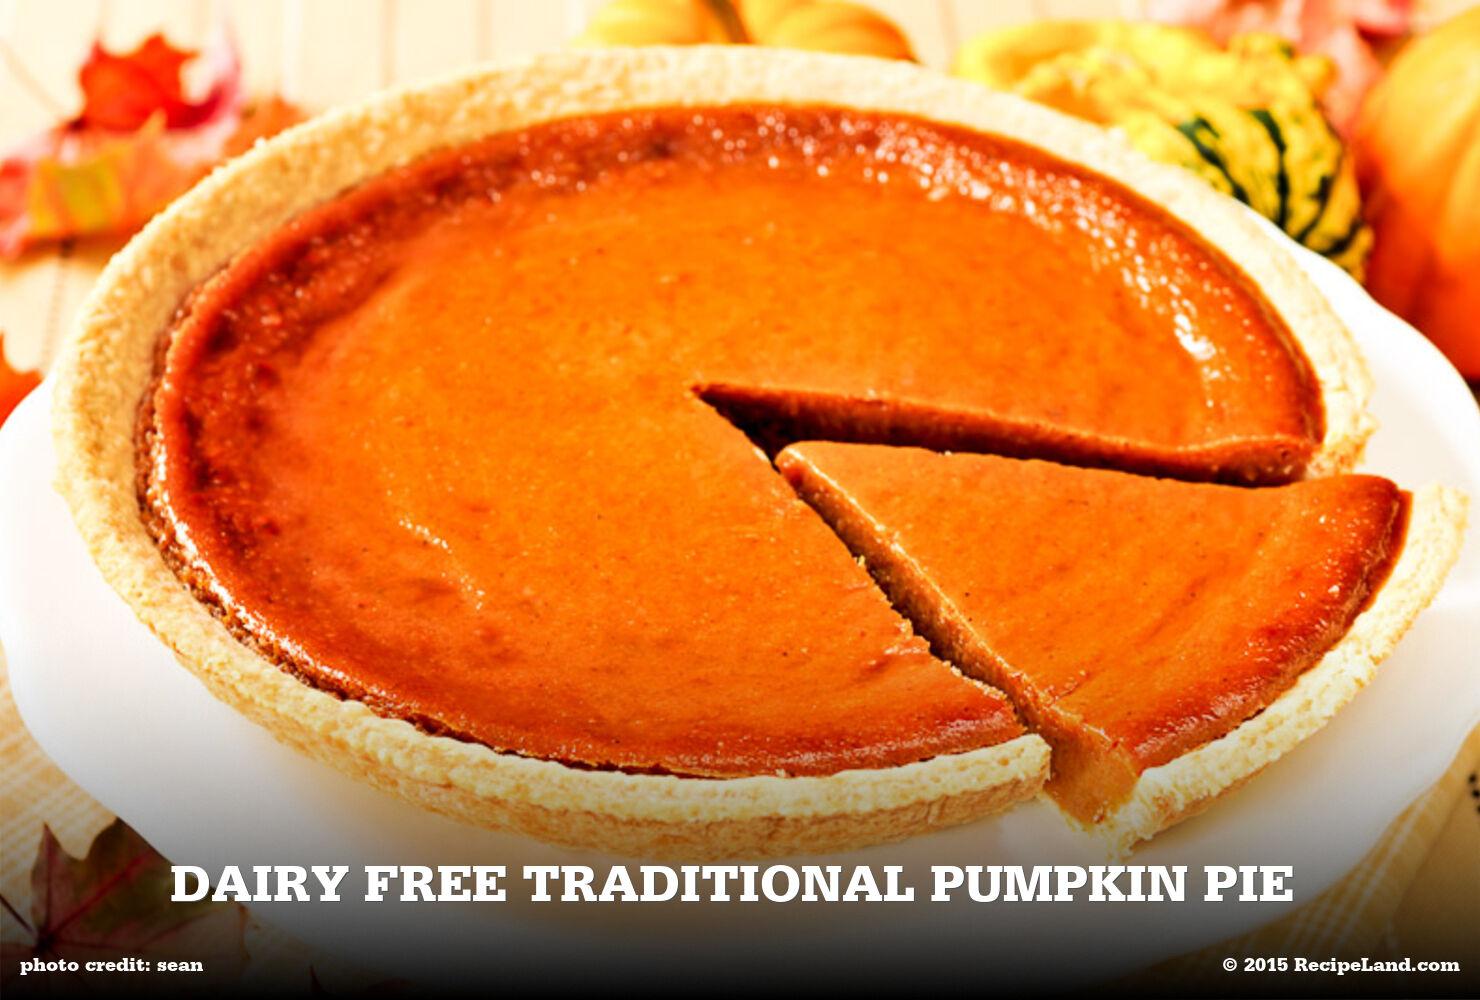 Dairy Free Traditional Pumpkin Pie